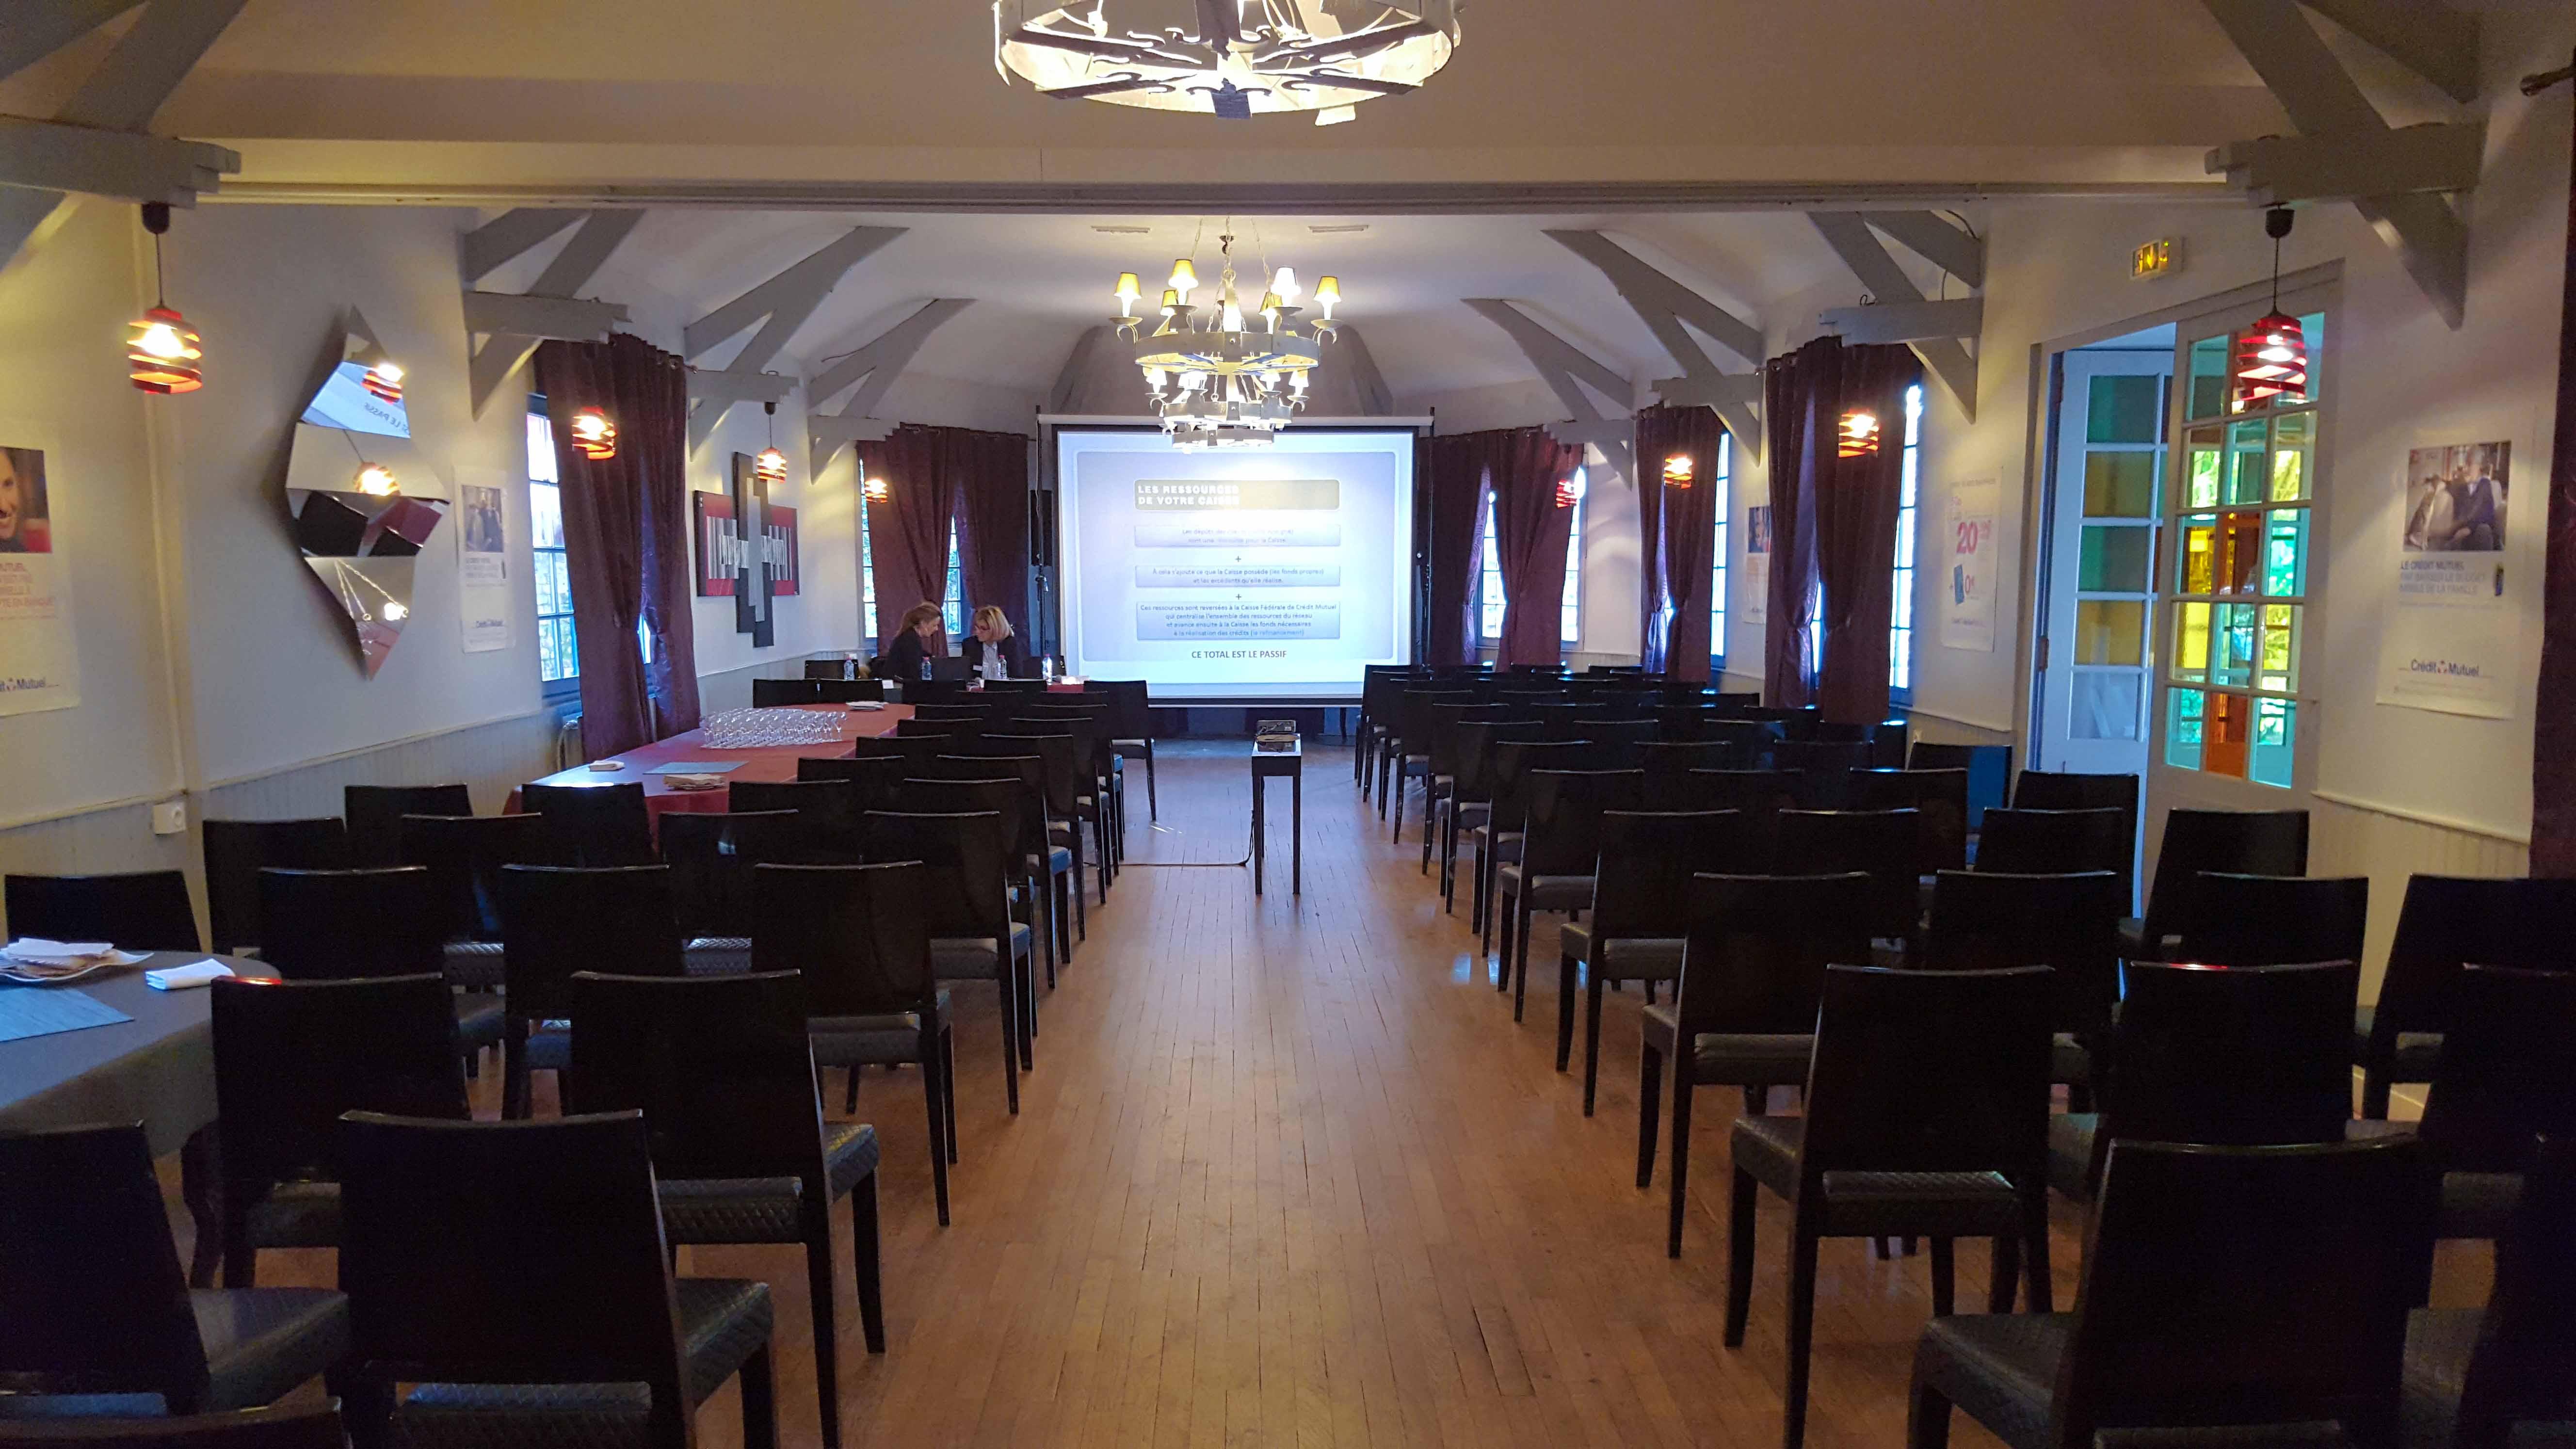 rikila-events-paris-location-ecran